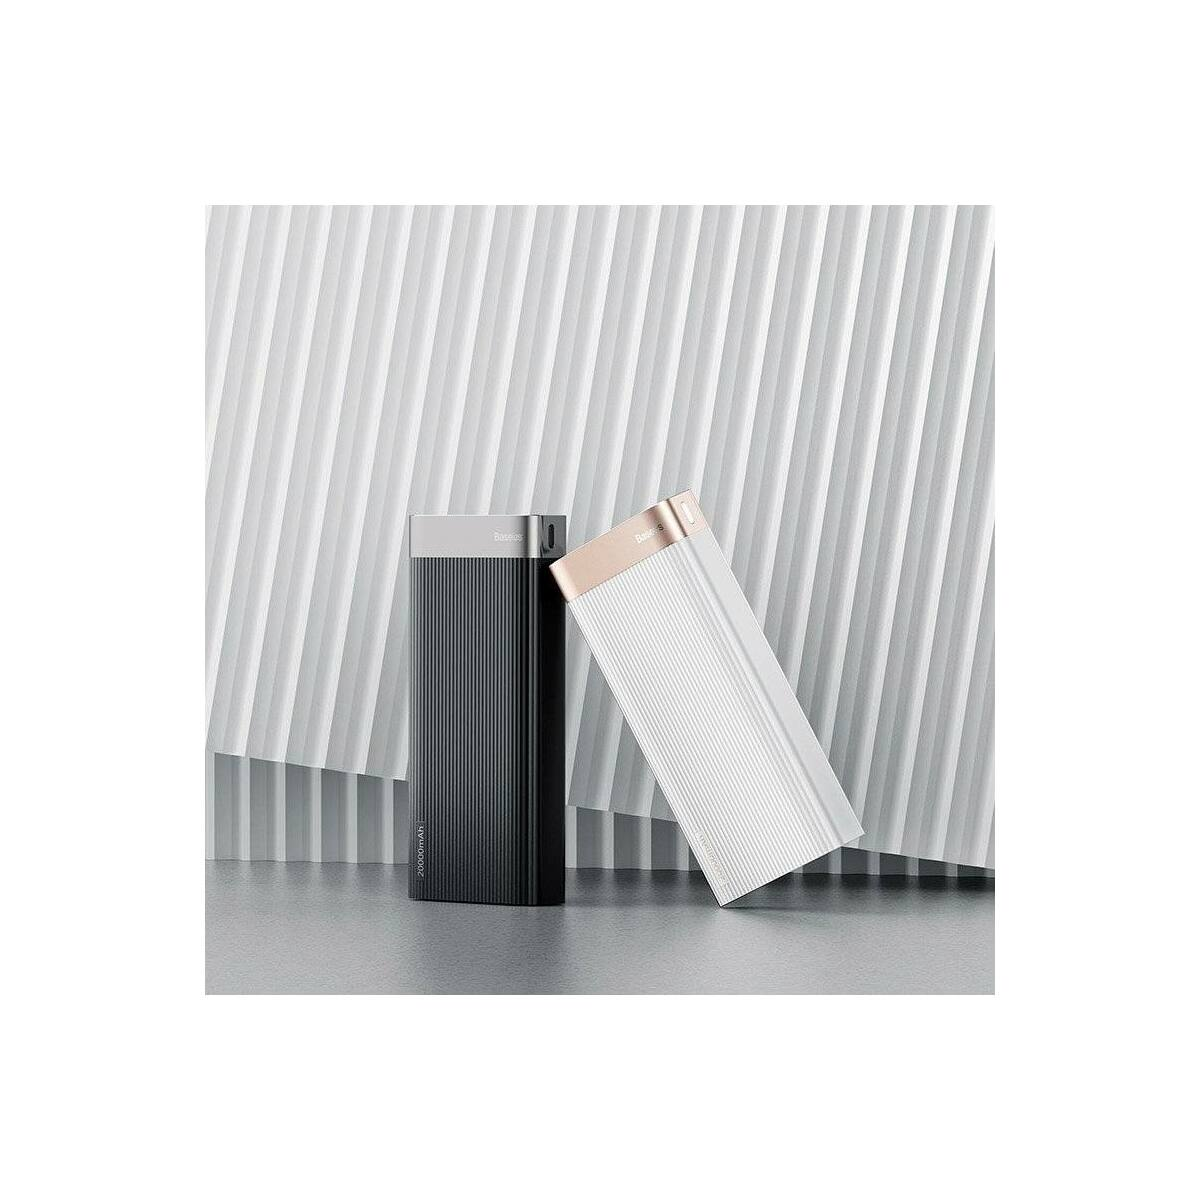 Baseus Power Bank Parallel (Micro USB + Type-C bemenet / dupla USB + Type-C PD kimenet), 18W, 5A, 20.000 mAh, fehér (PPALL-APX02)